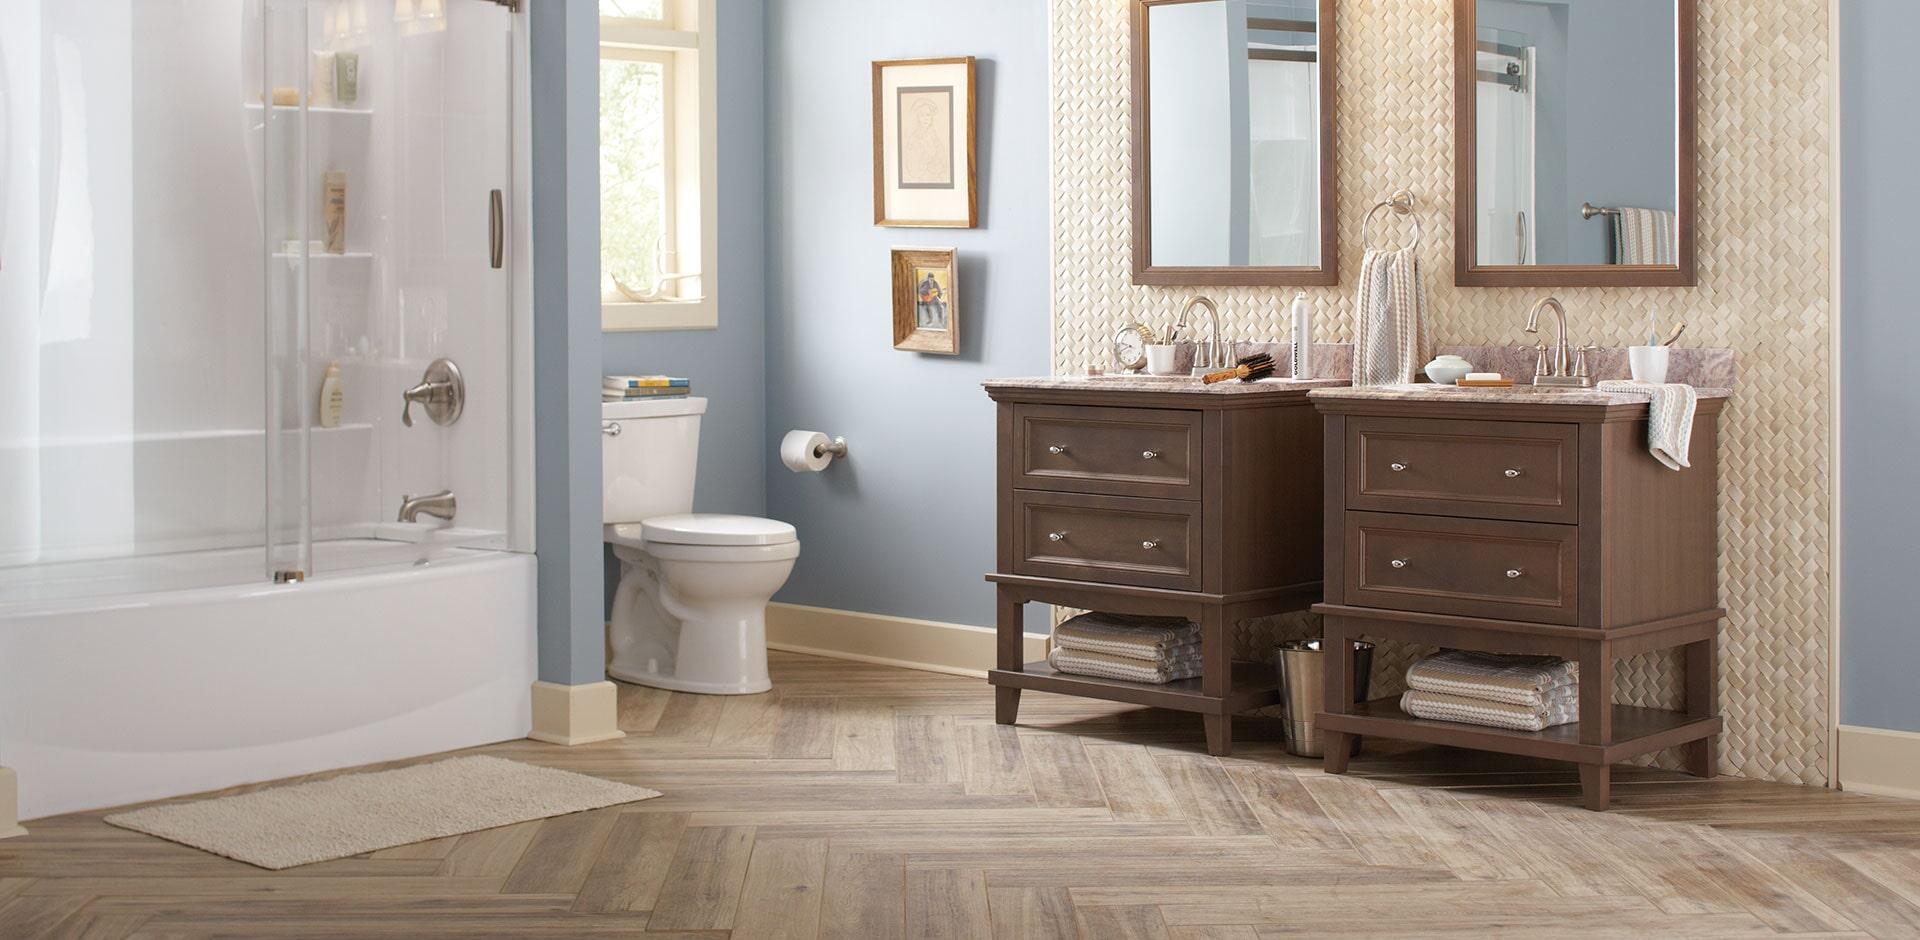 crema arched herringbone polished bathroom design